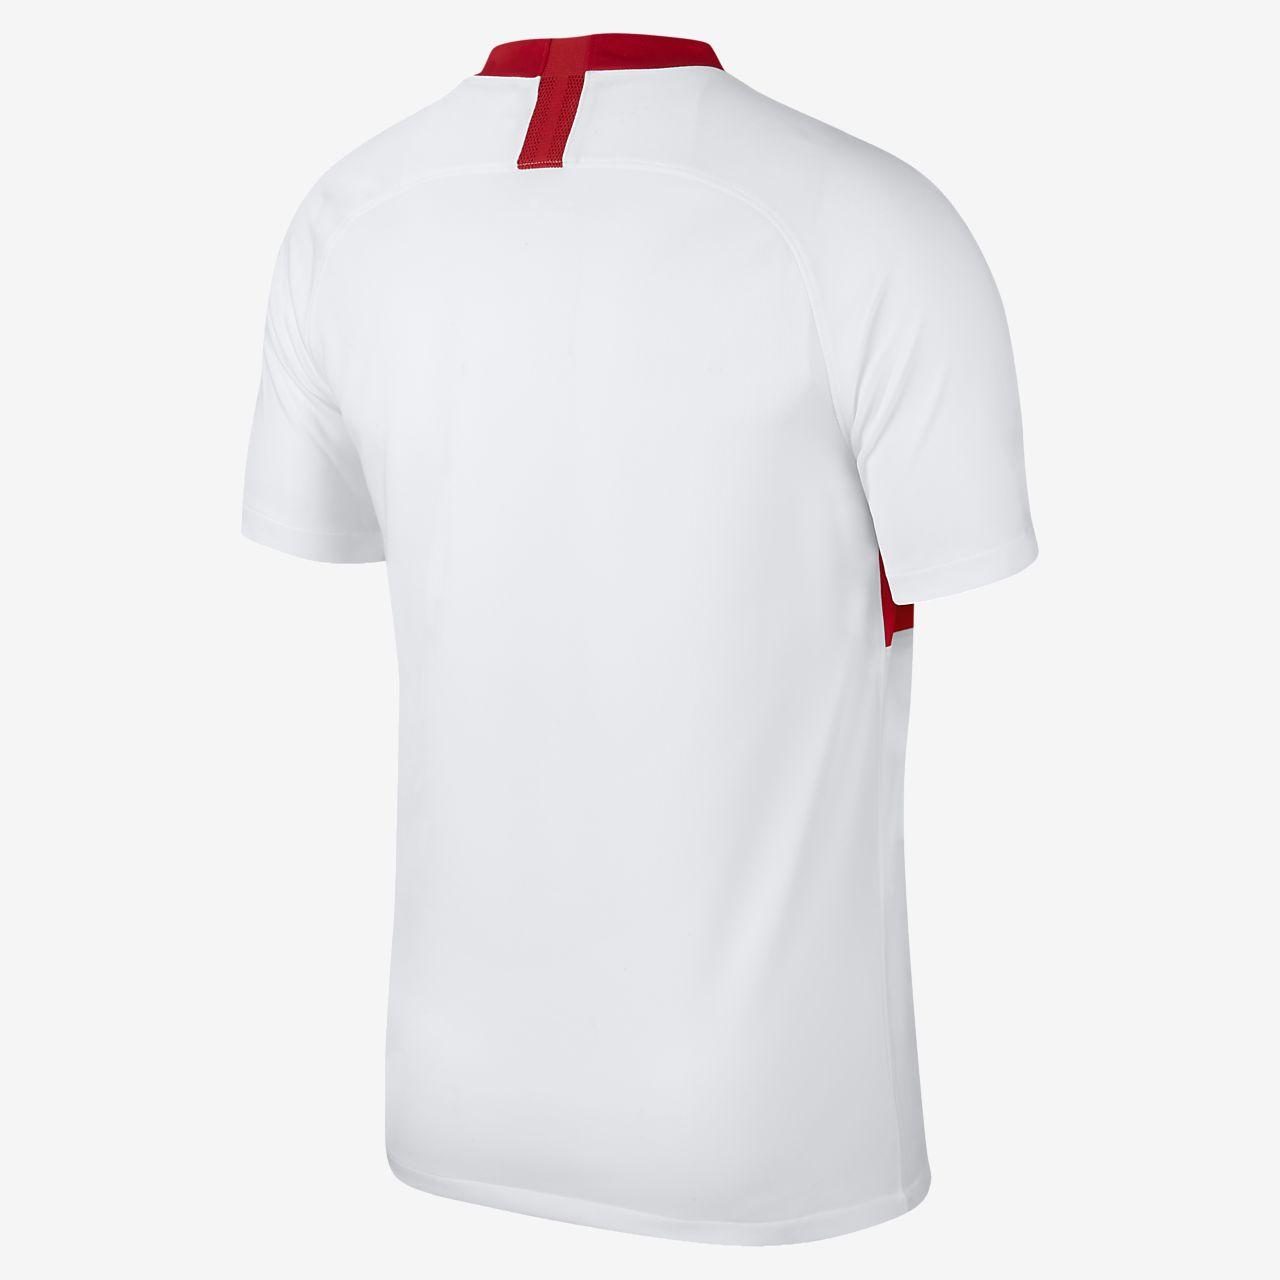 1248cae3a77 2018 19 Spartak Moscow Stadium Away Men s Football Shirt. Nike.com GB